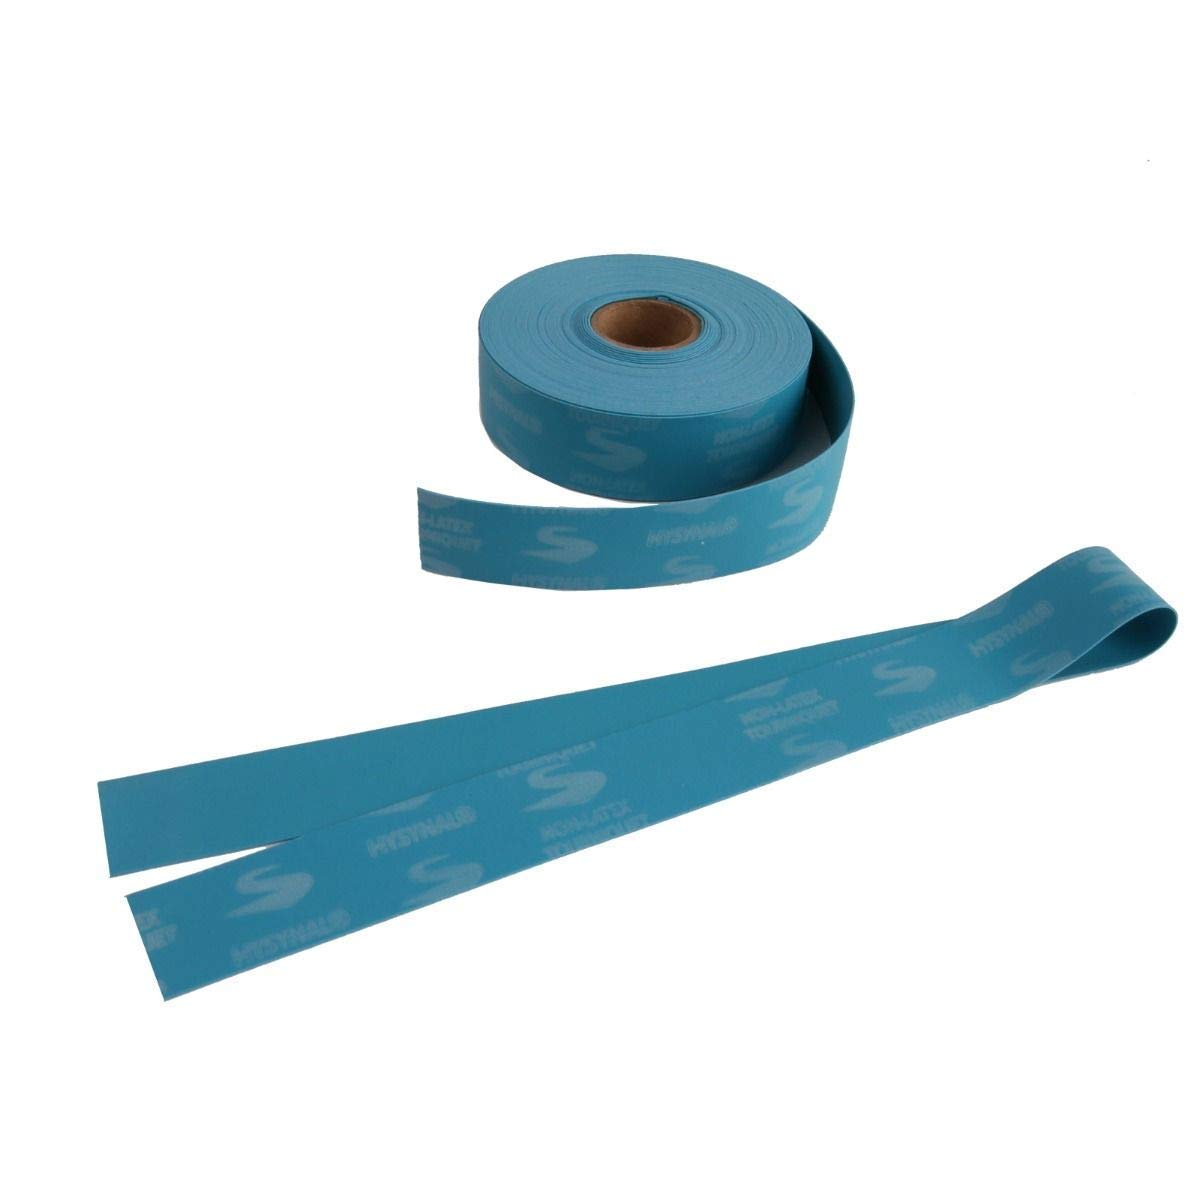 Hysynal Disposable Non-Latex Tourniquets, 100 Straps, 4 Reels of 25 Blue Disposable Tourniquet Straps for Drawing Blood